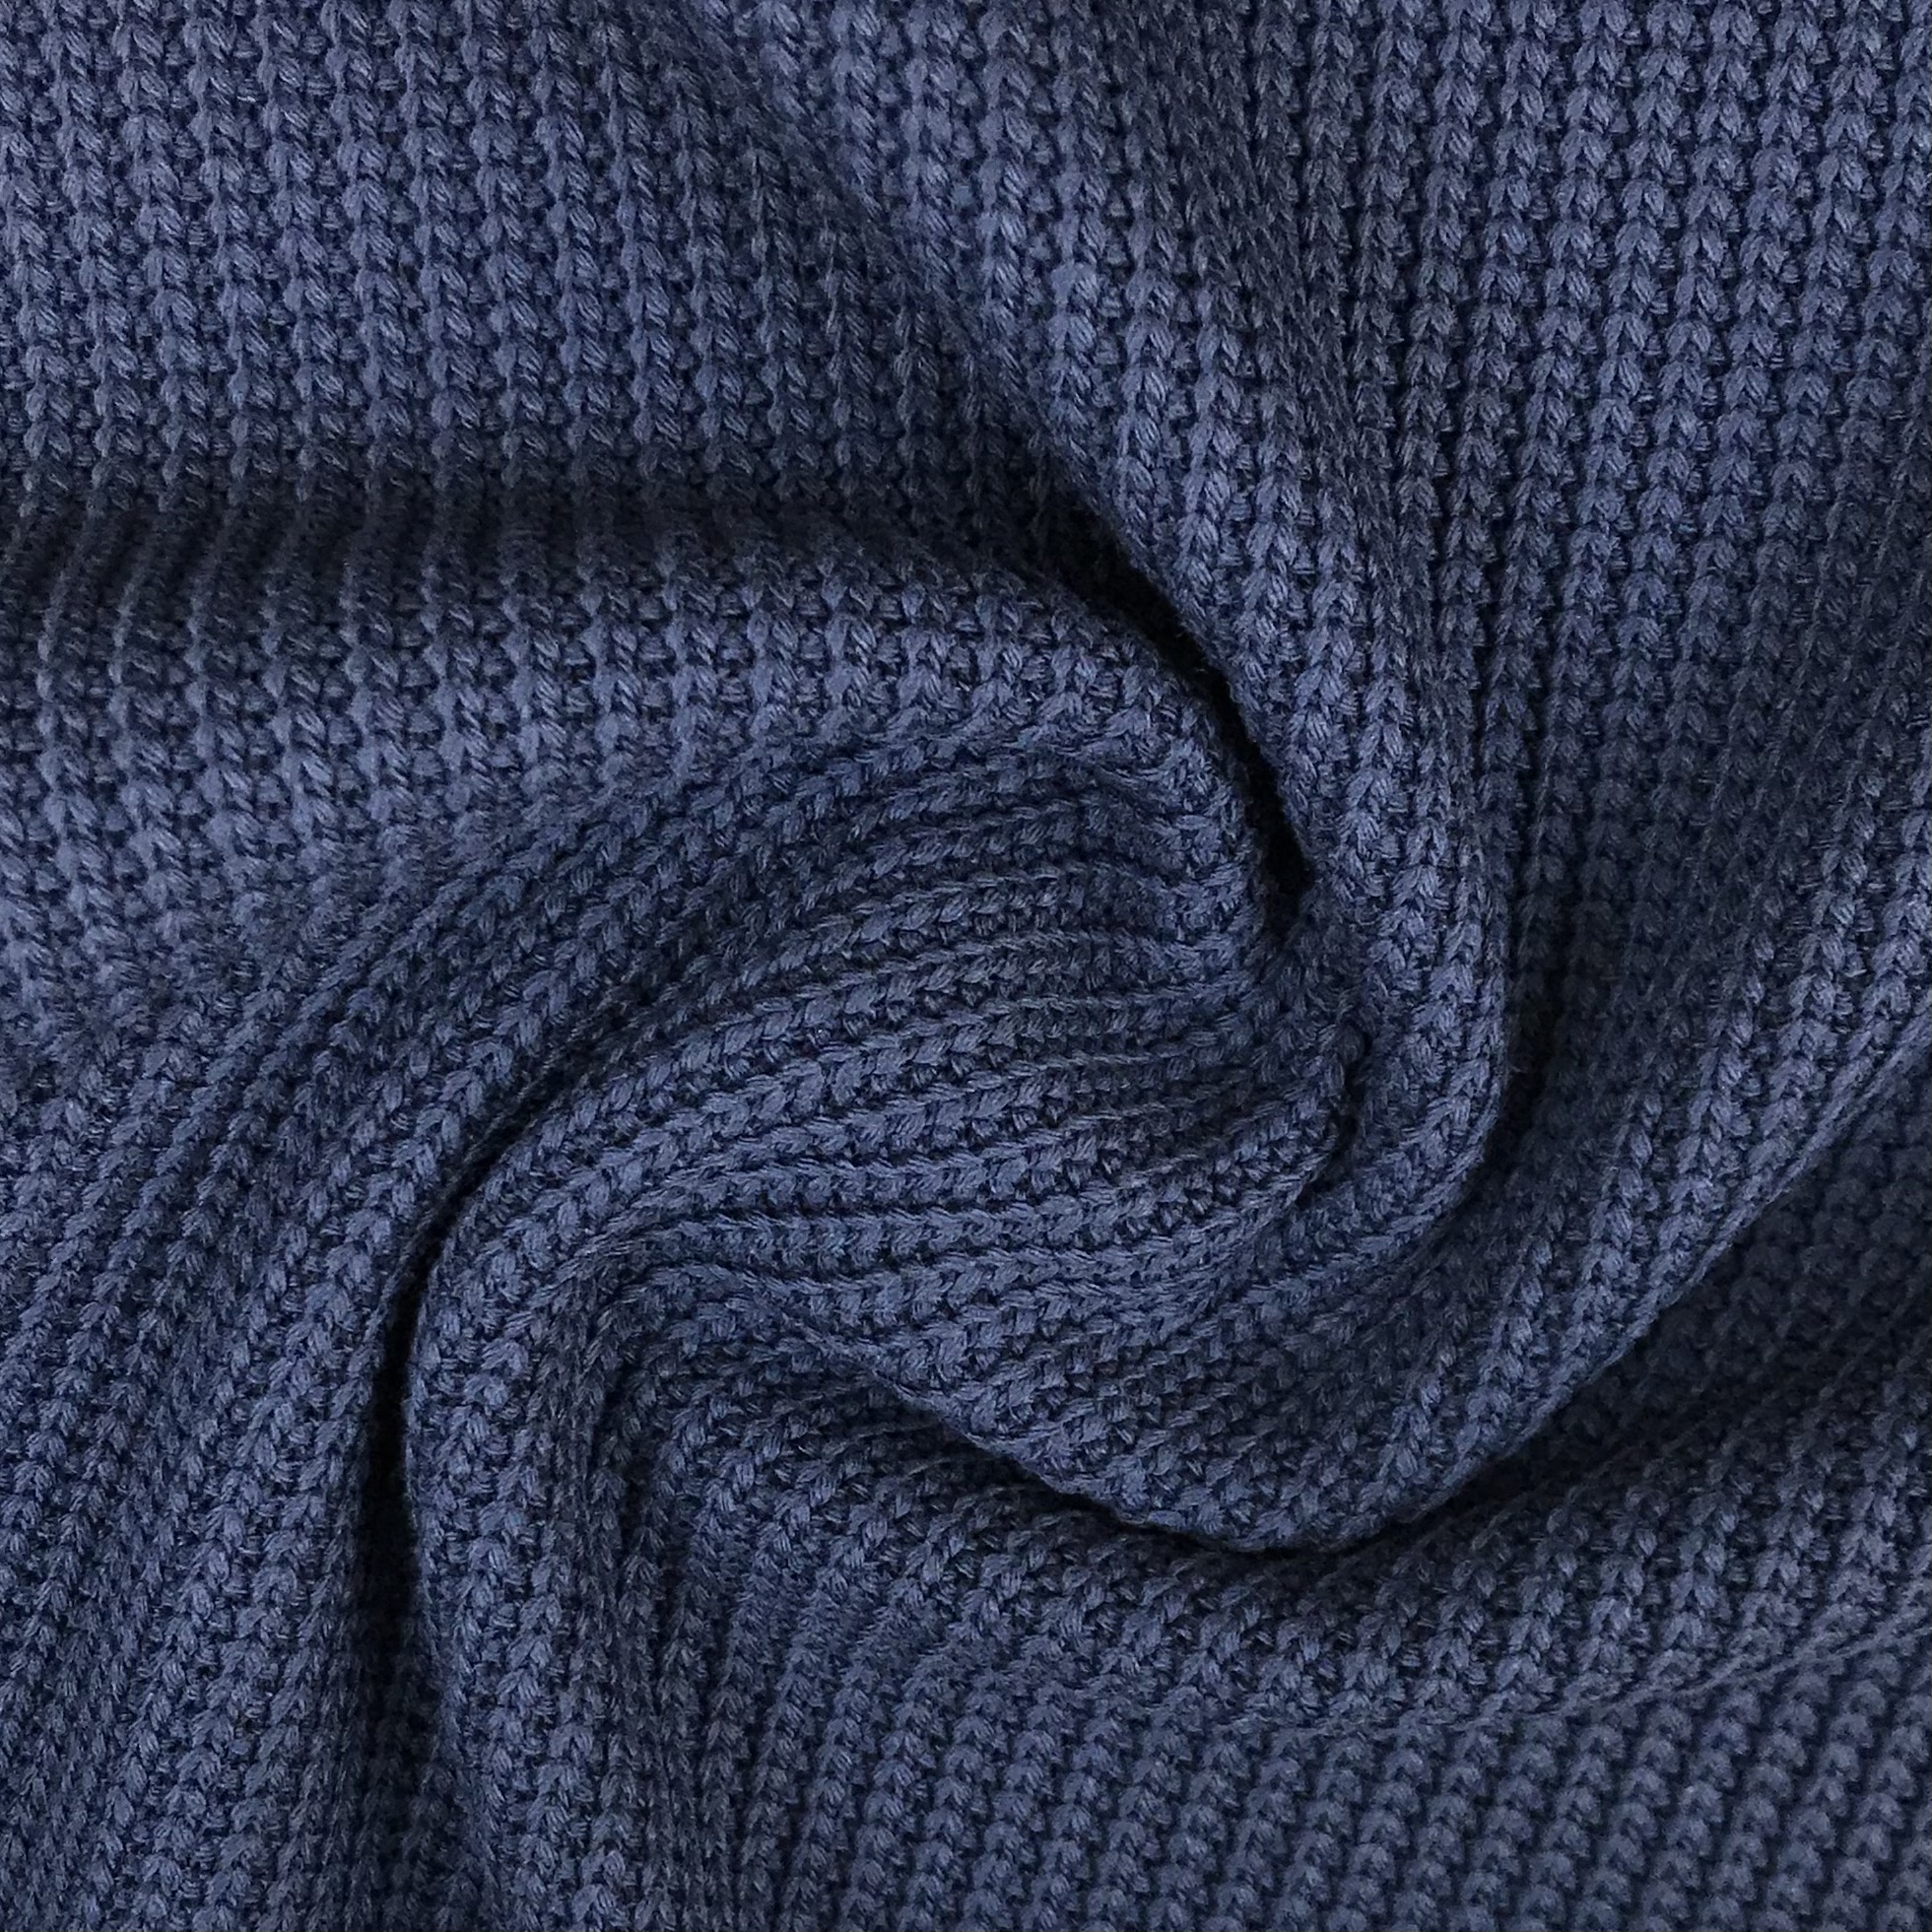 Grobstrick Baumwolle, dunkelblau. Art. 4453-008